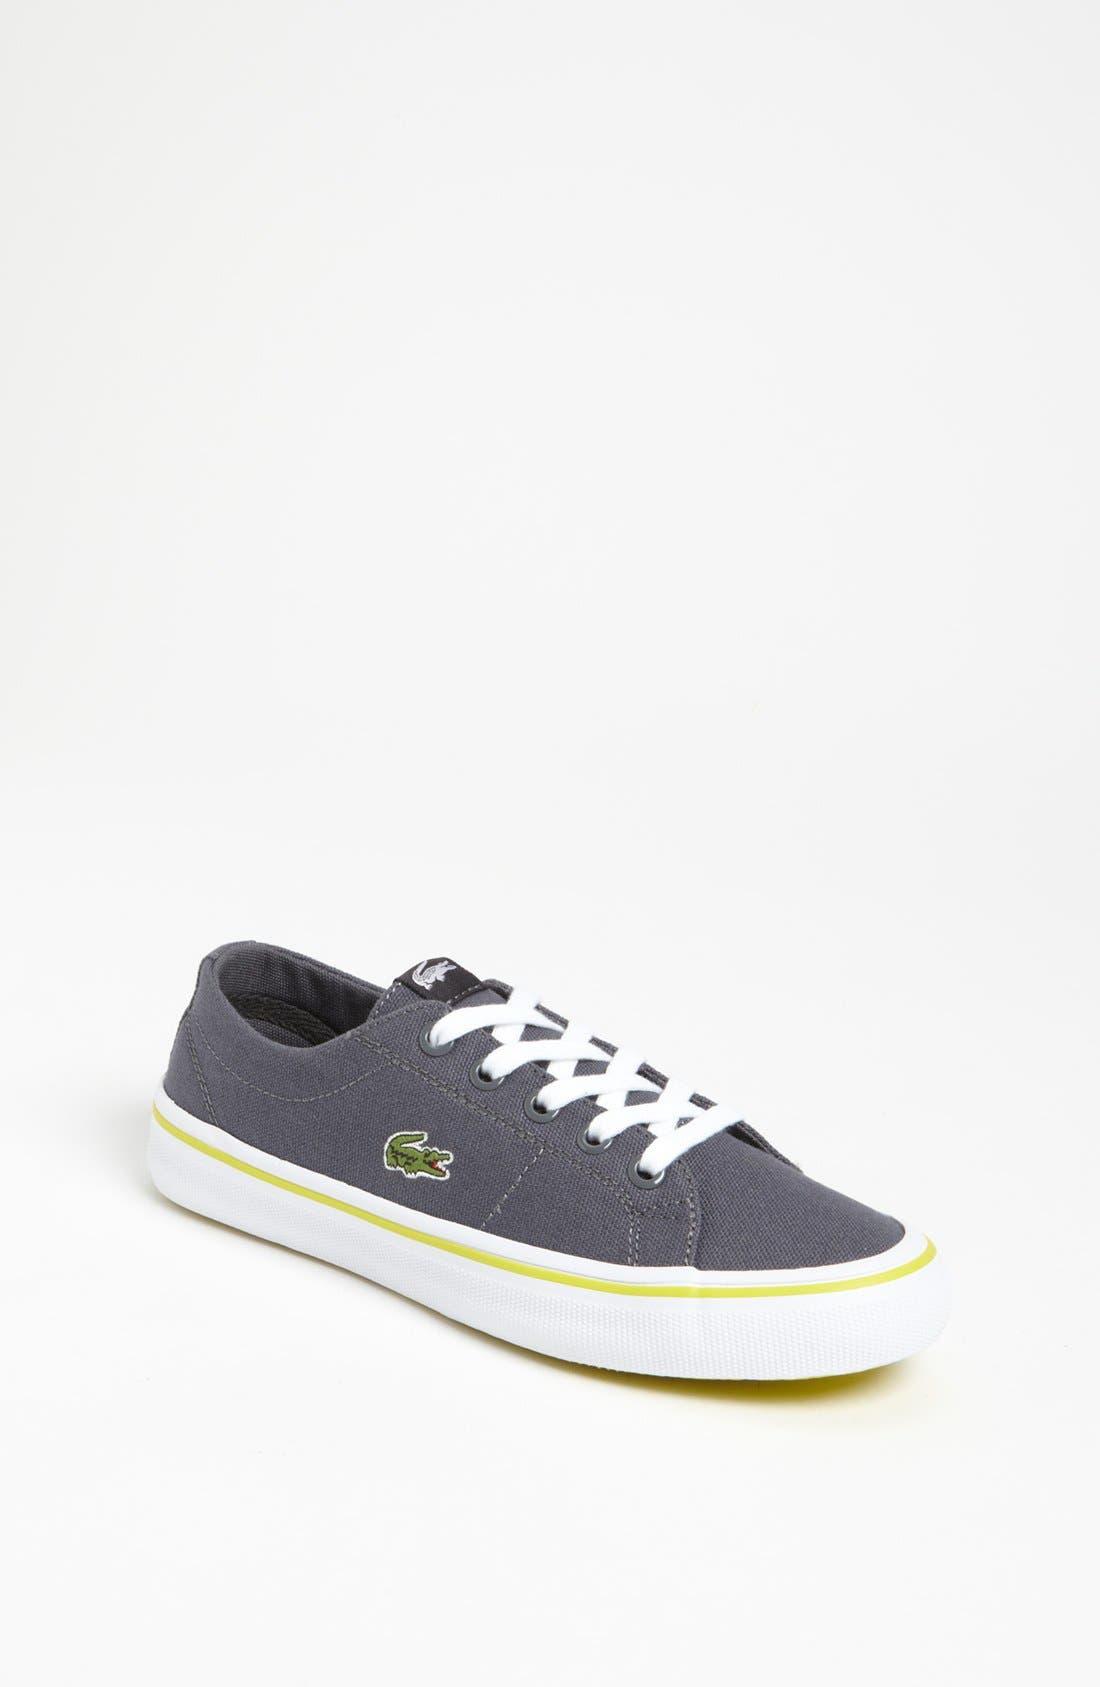 Main Image - Lacoste 'Marcel' Sneaker (Toddler & Little Kid)